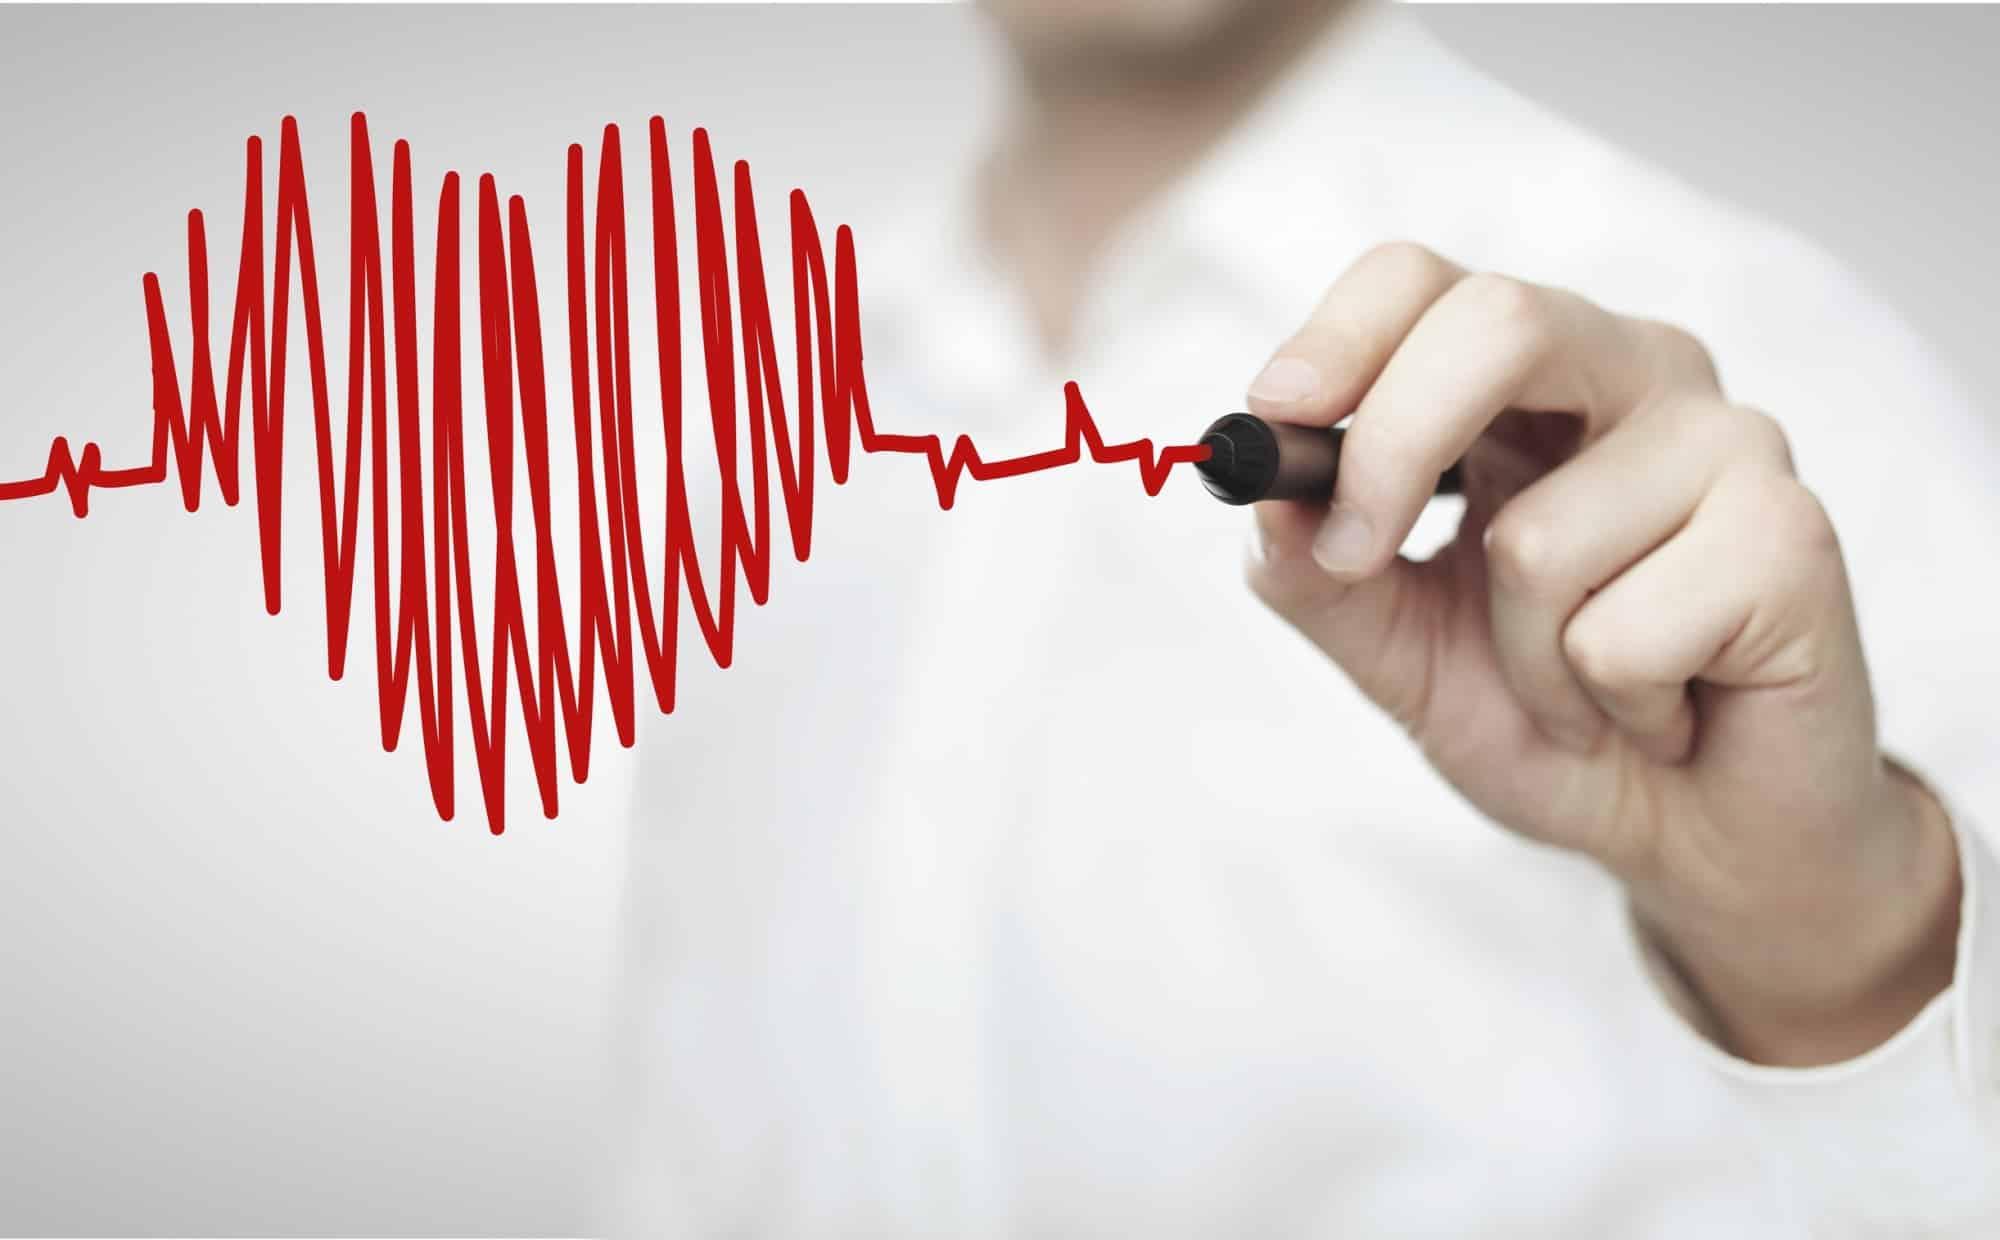 Aegon-Enfermedades-cardiovasculares